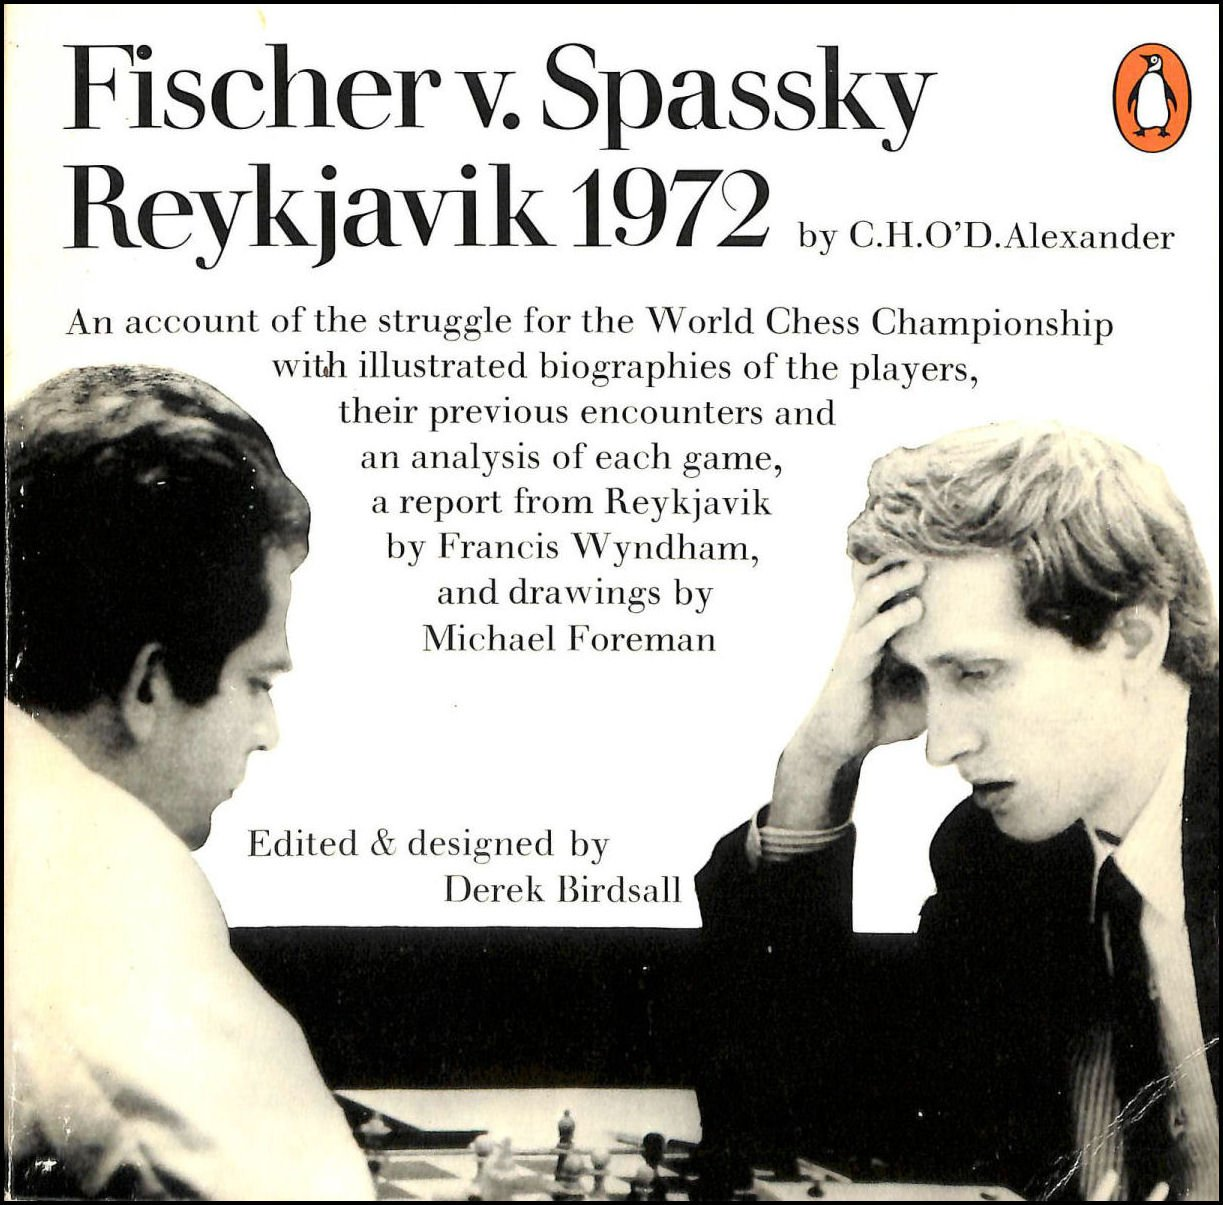 Fischer v. Spassky : Reykjavik 1972